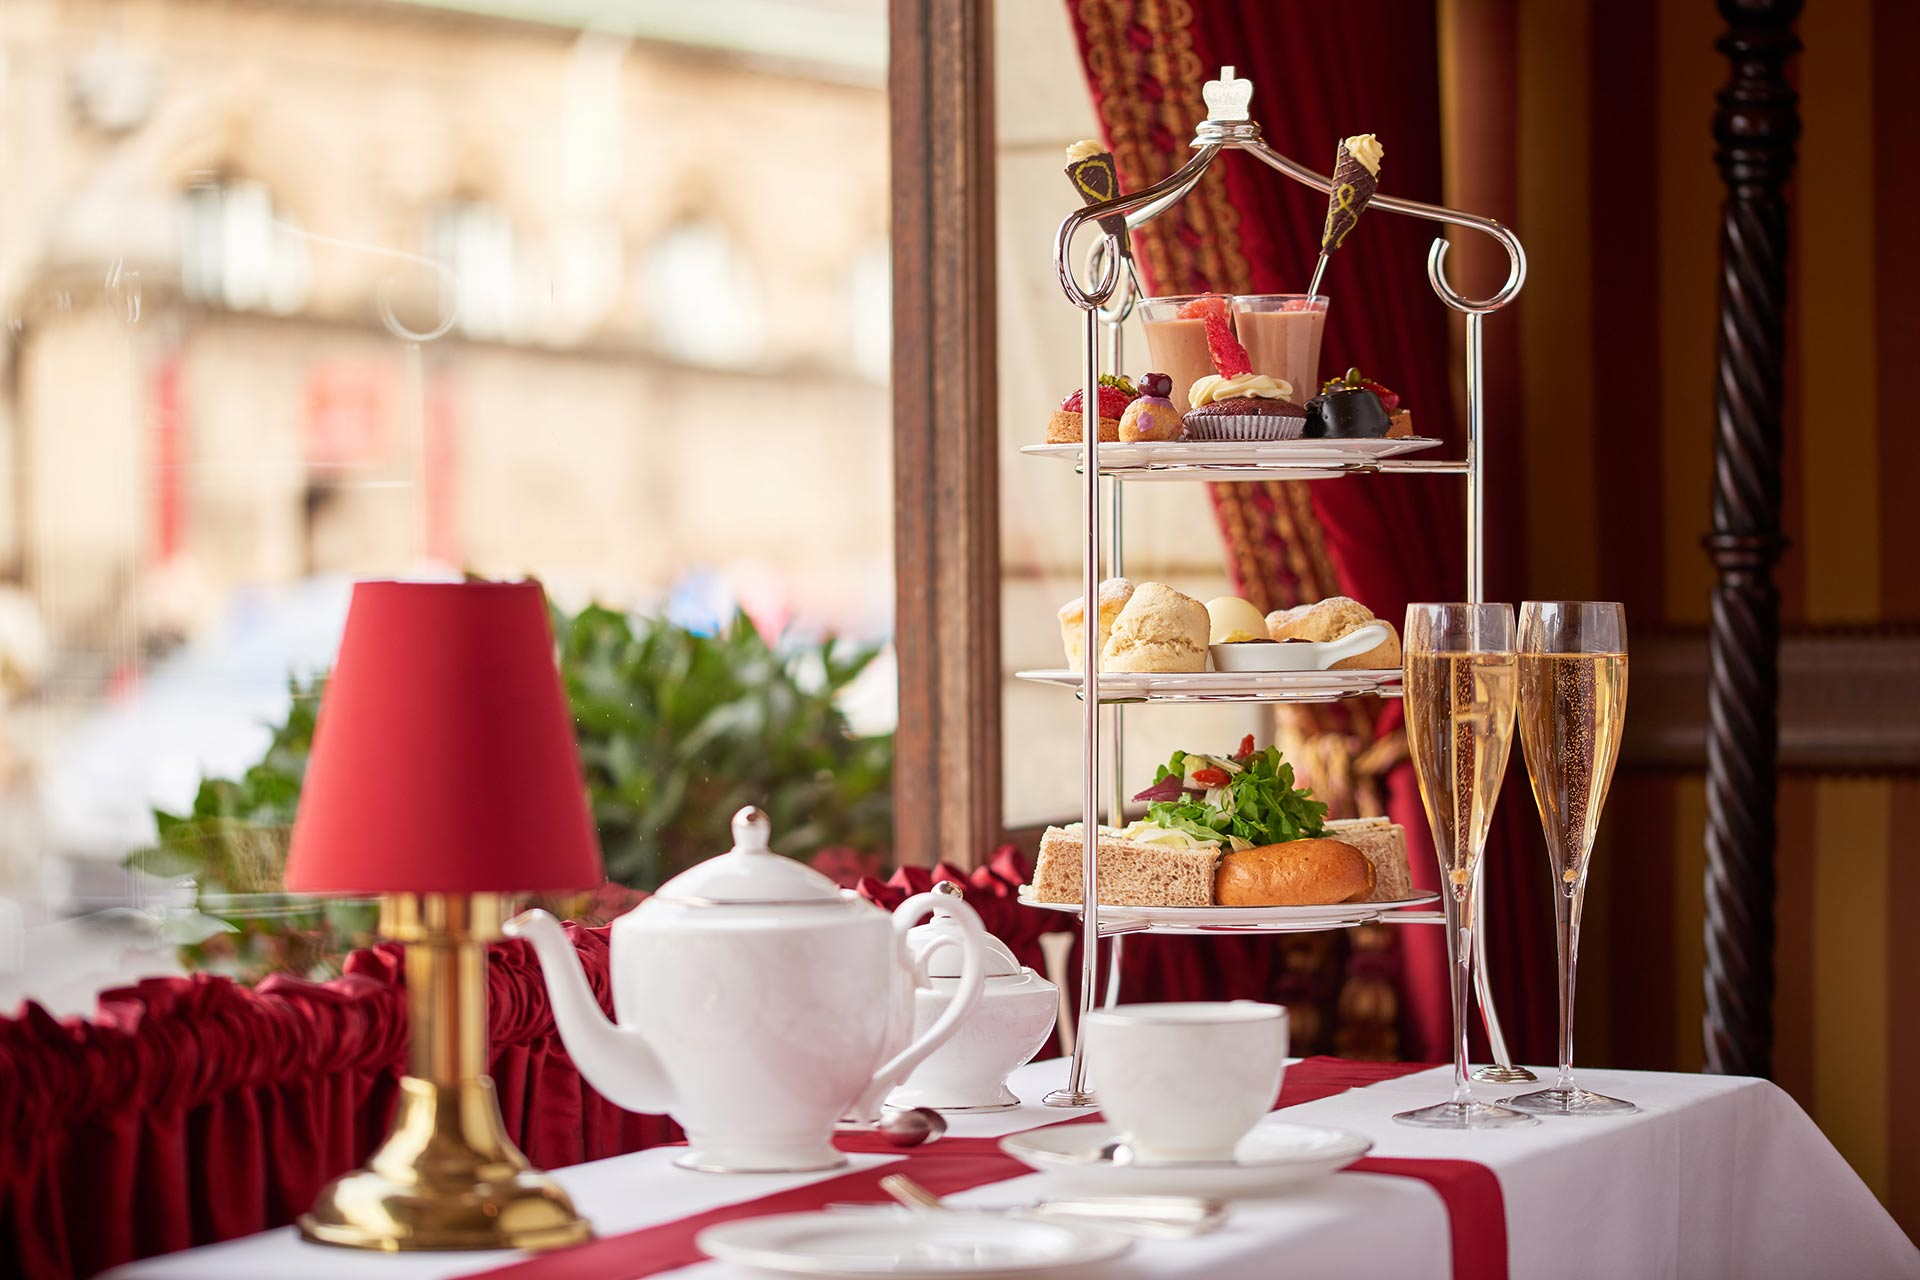 Rubens' Royal Afternoon Tea at The Rubens at the Palace in London